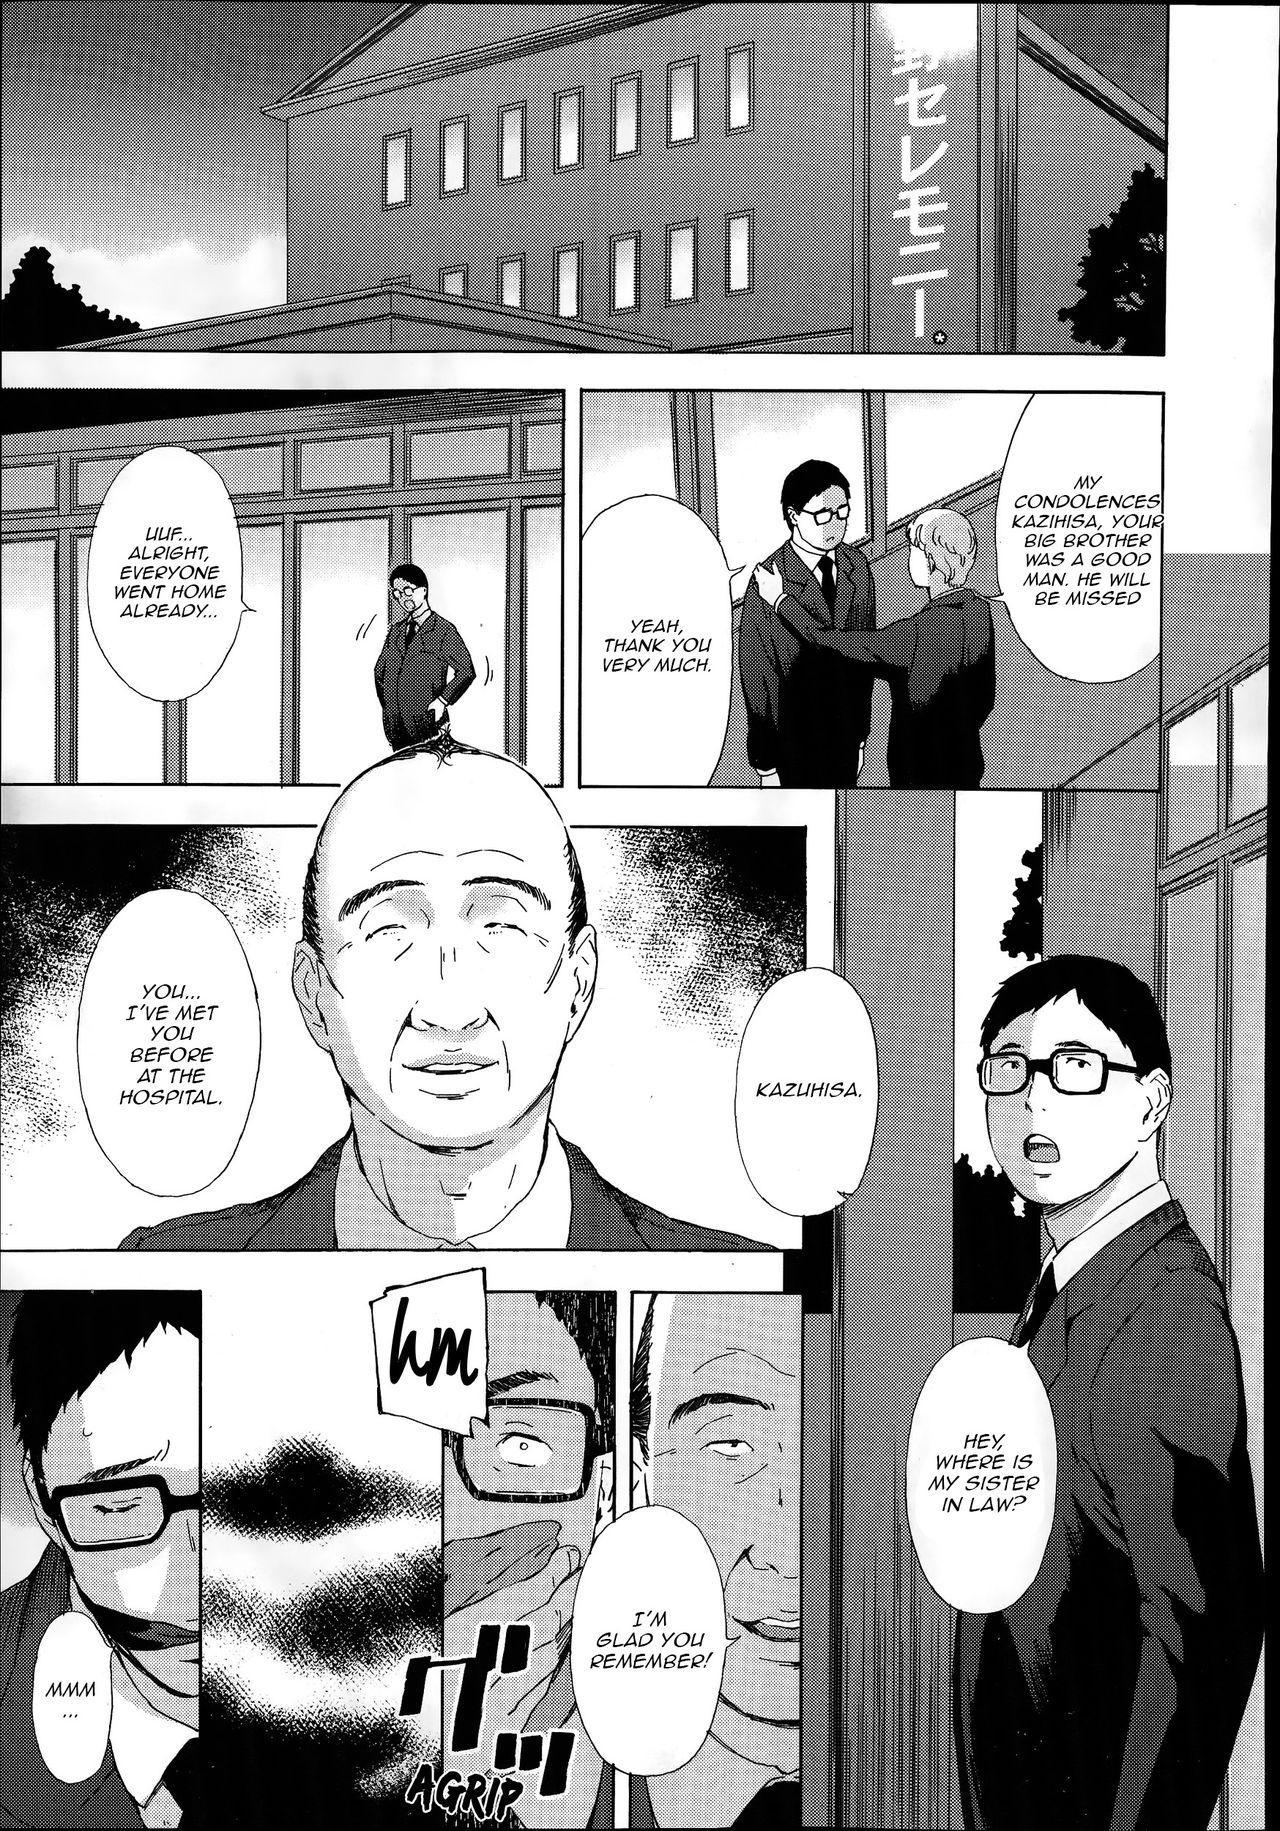 Gishi Eri no himegoto | The Secret of Eri, my Sister in Law 1-2 20